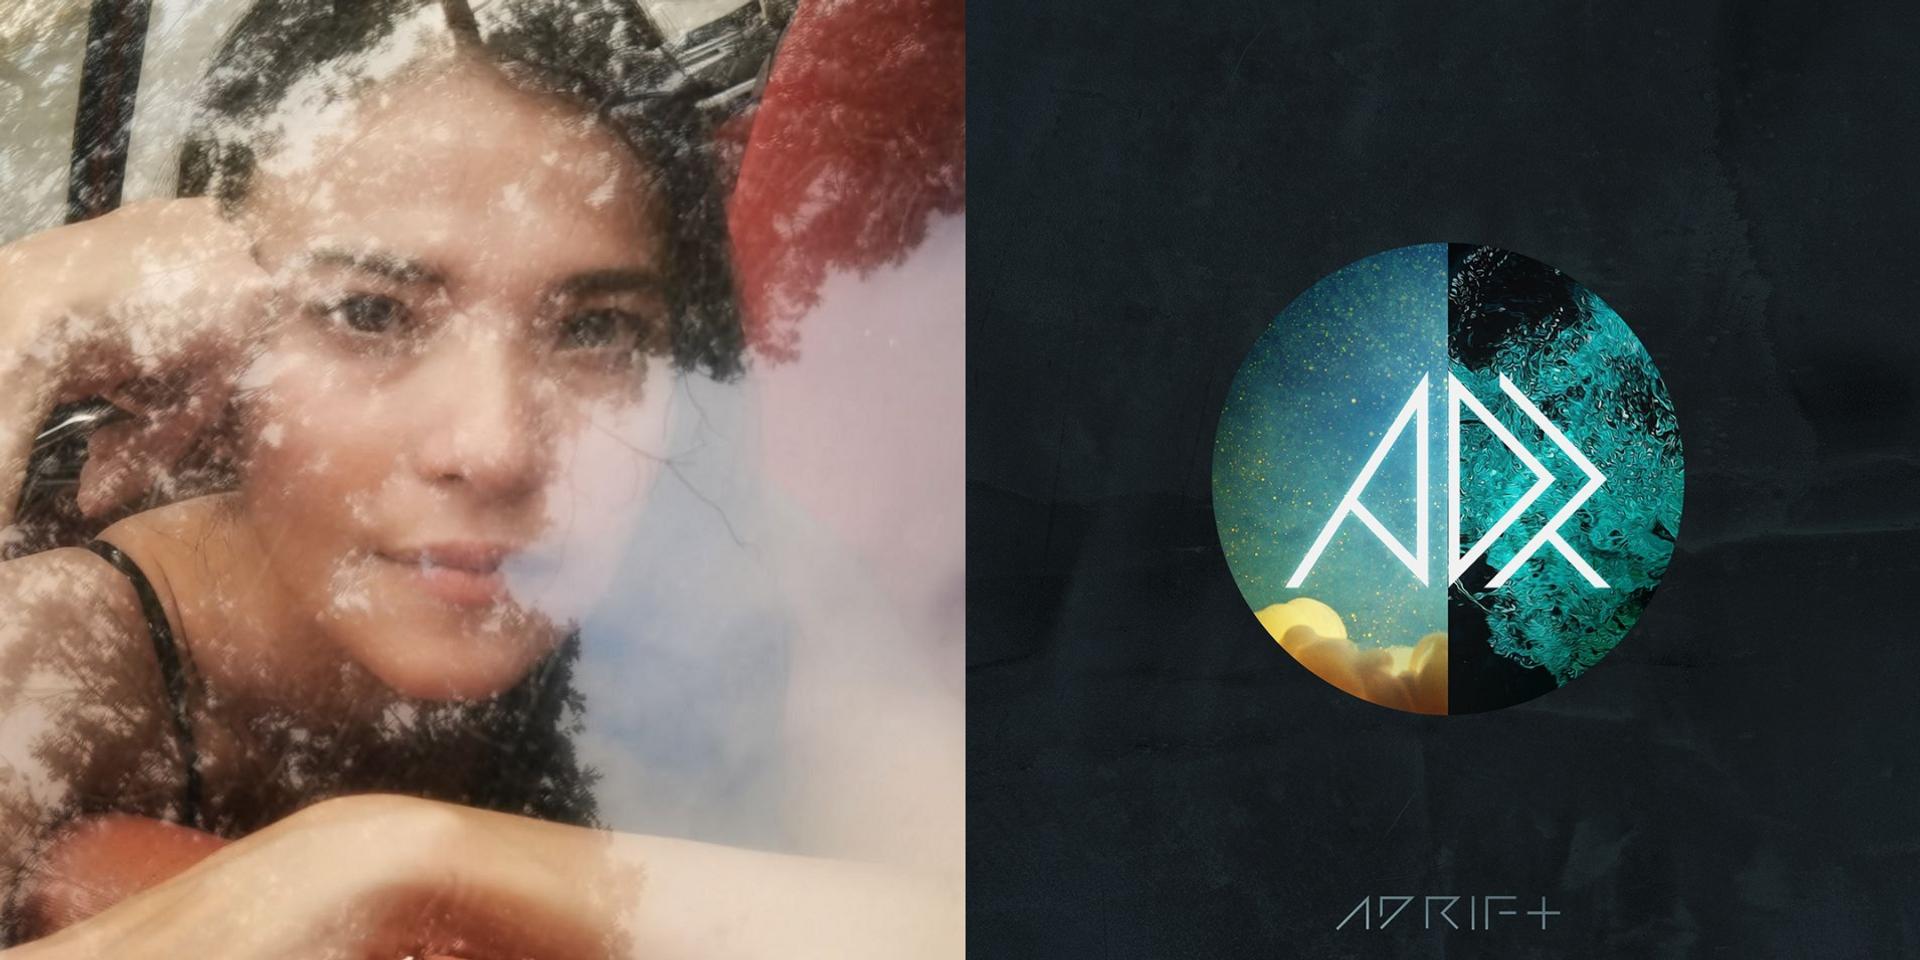 Alessandra De Rossi to release remastered version of debut album, 'Adrift'